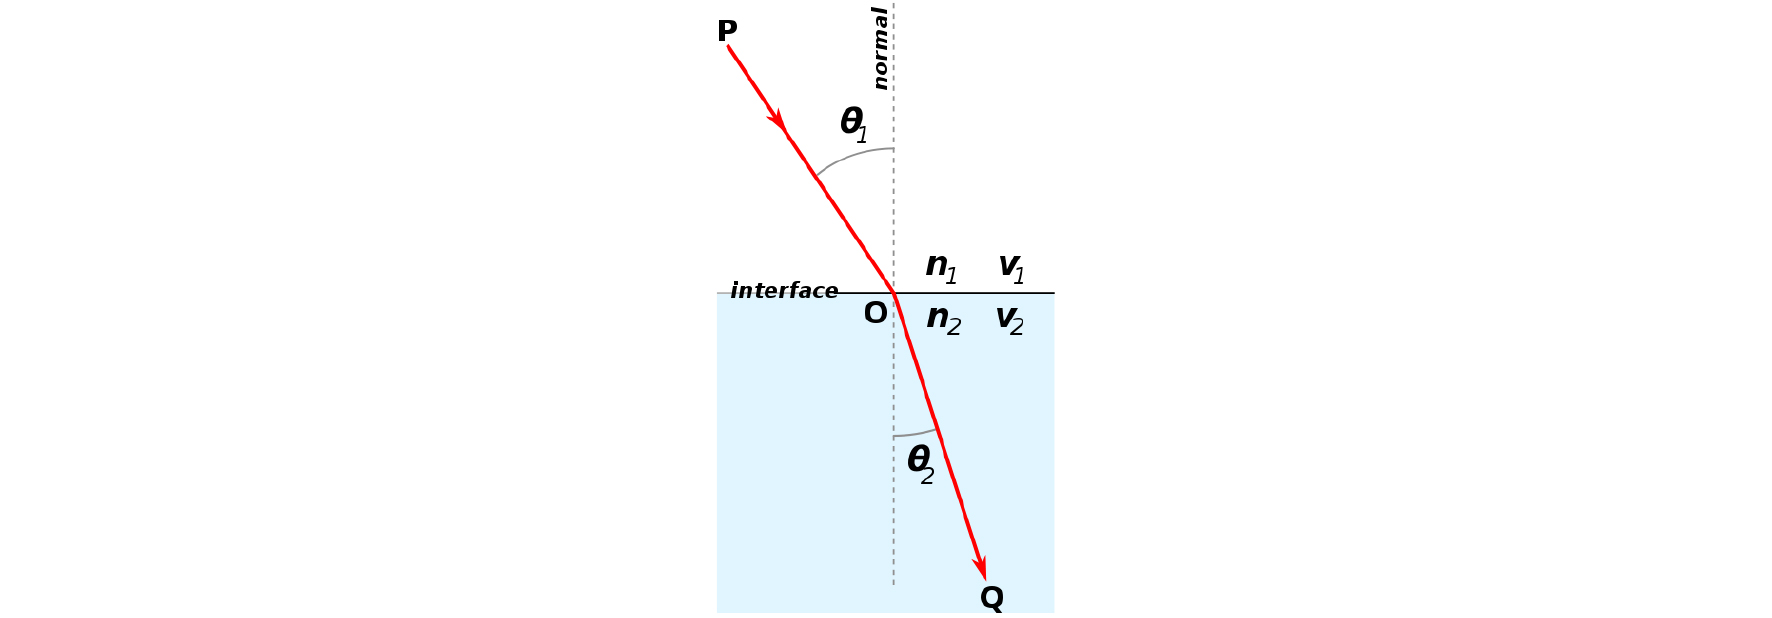 http://static.apub.kr/journalsite/sites/kirr/2020-029-03/N0010290306/images/kirr_29_03_06_F5.jpg